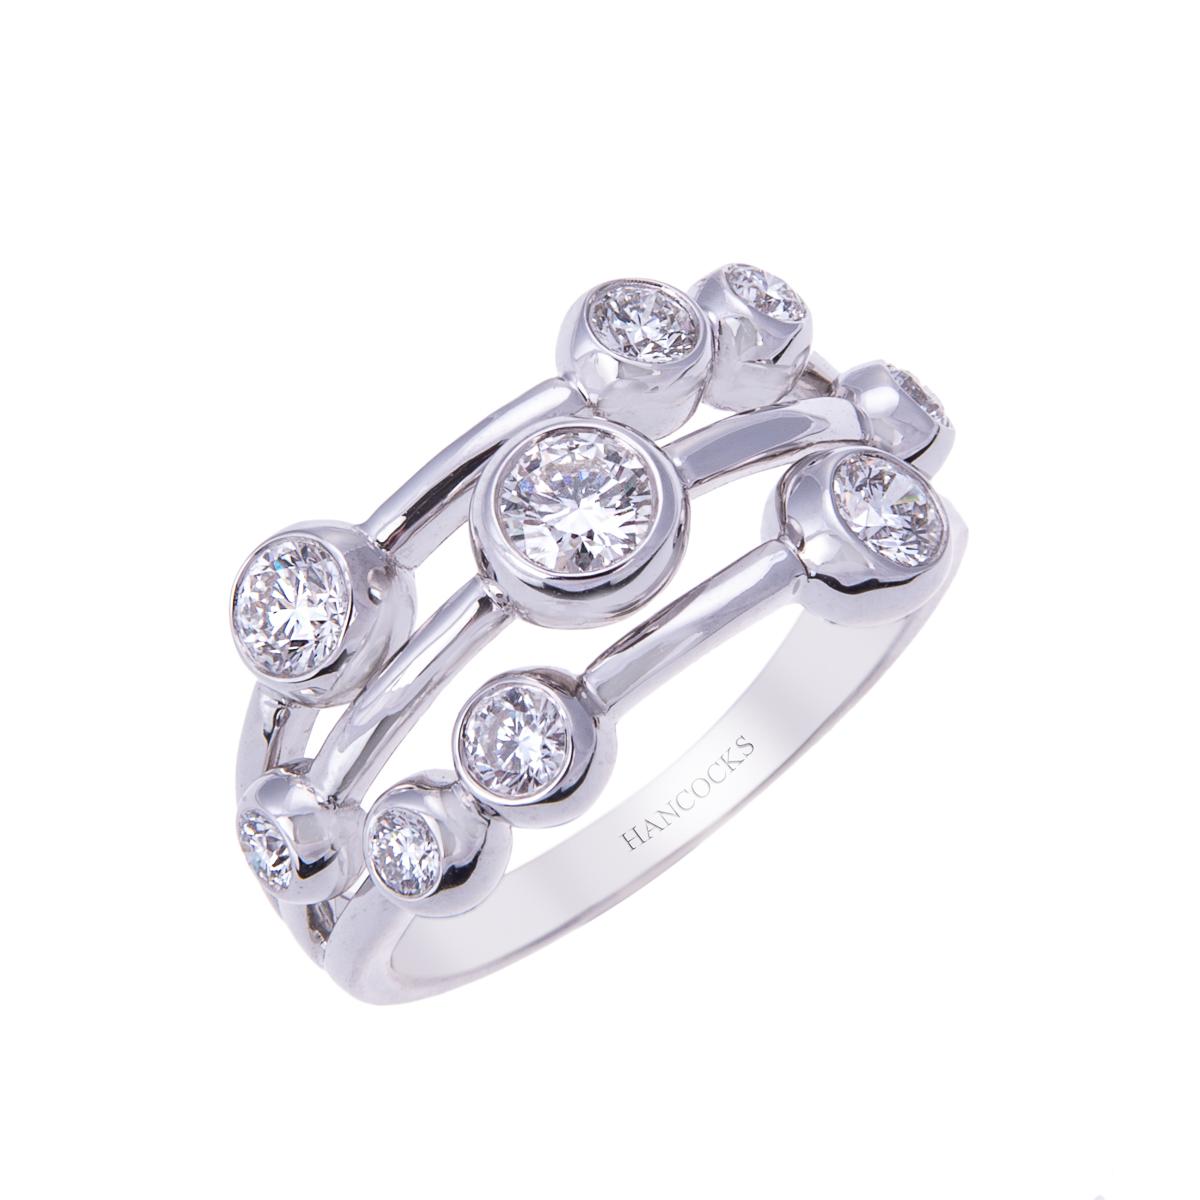 H 171019 45 white gold diamond set dress ring